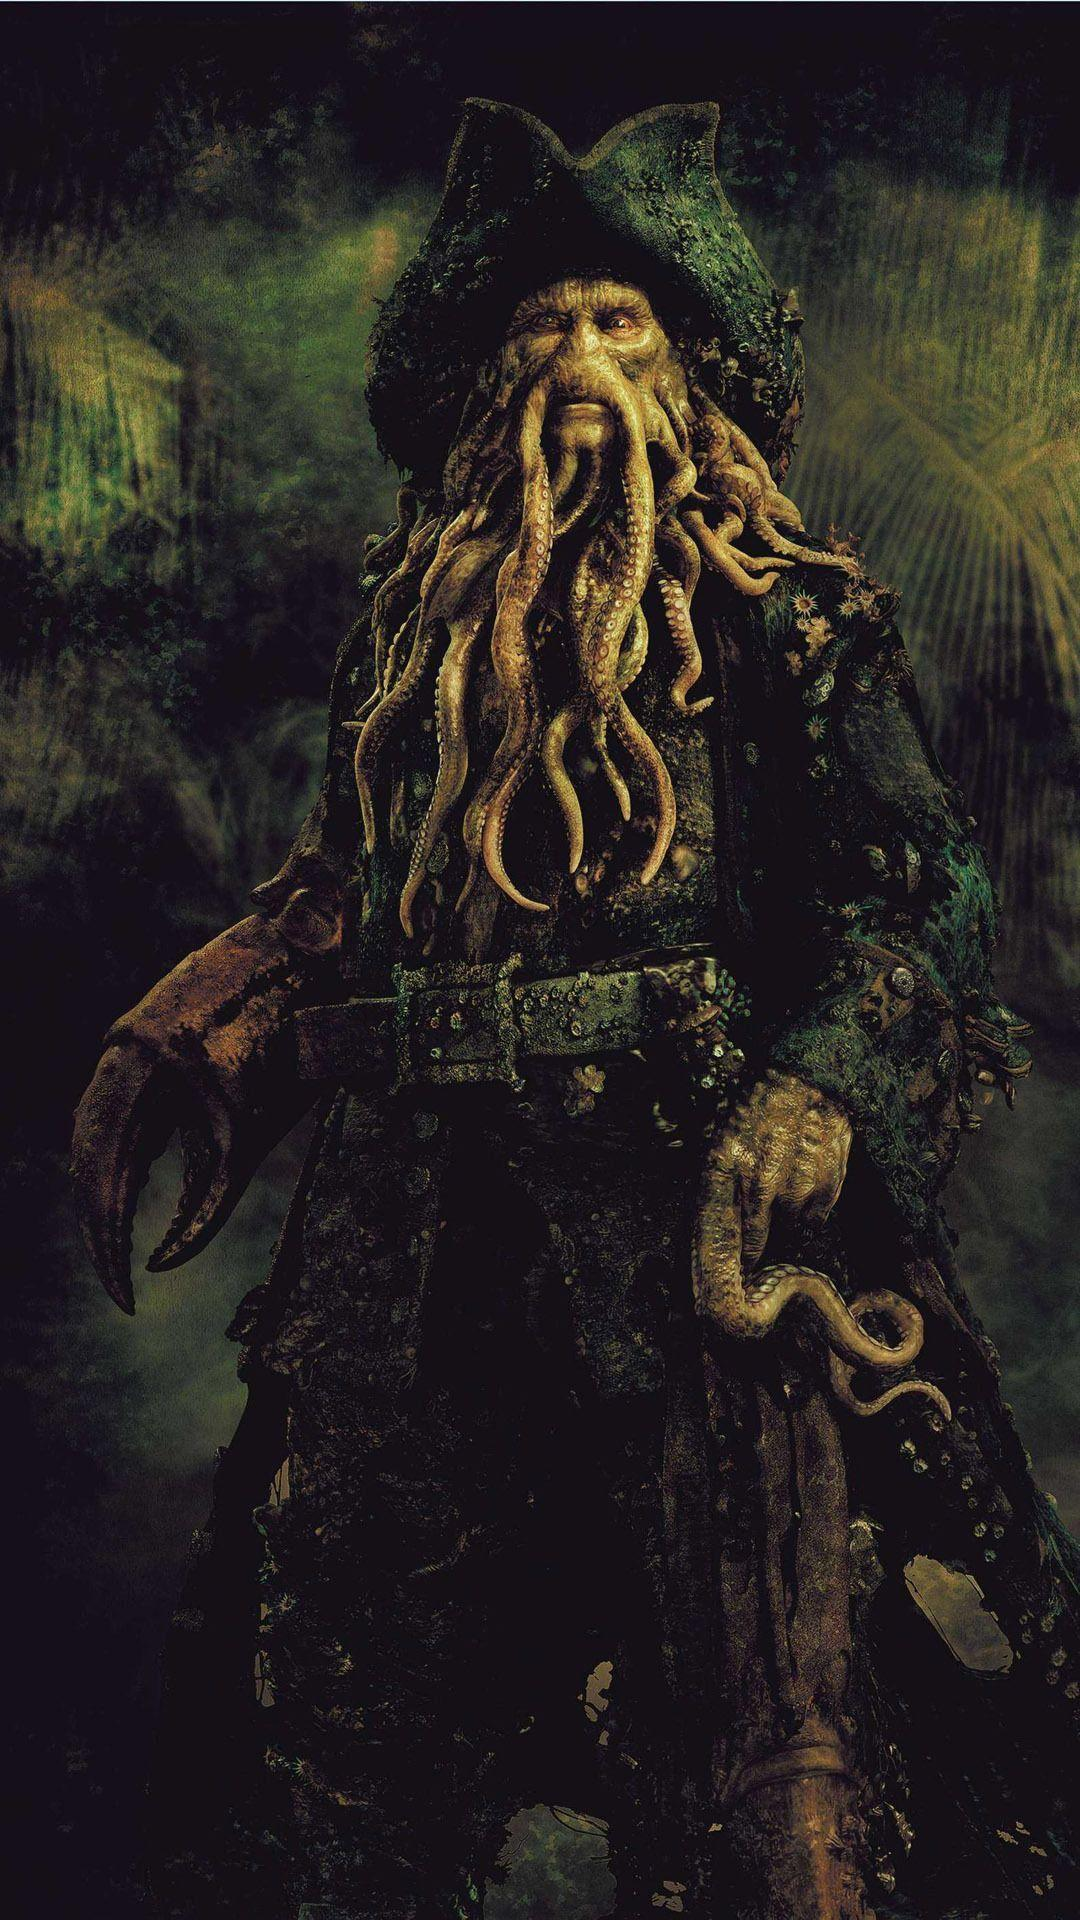 Davy Jones Pirates Des Caraibes : jones, pirates, caraibes, Jones, Wallpapers, Wallpaper